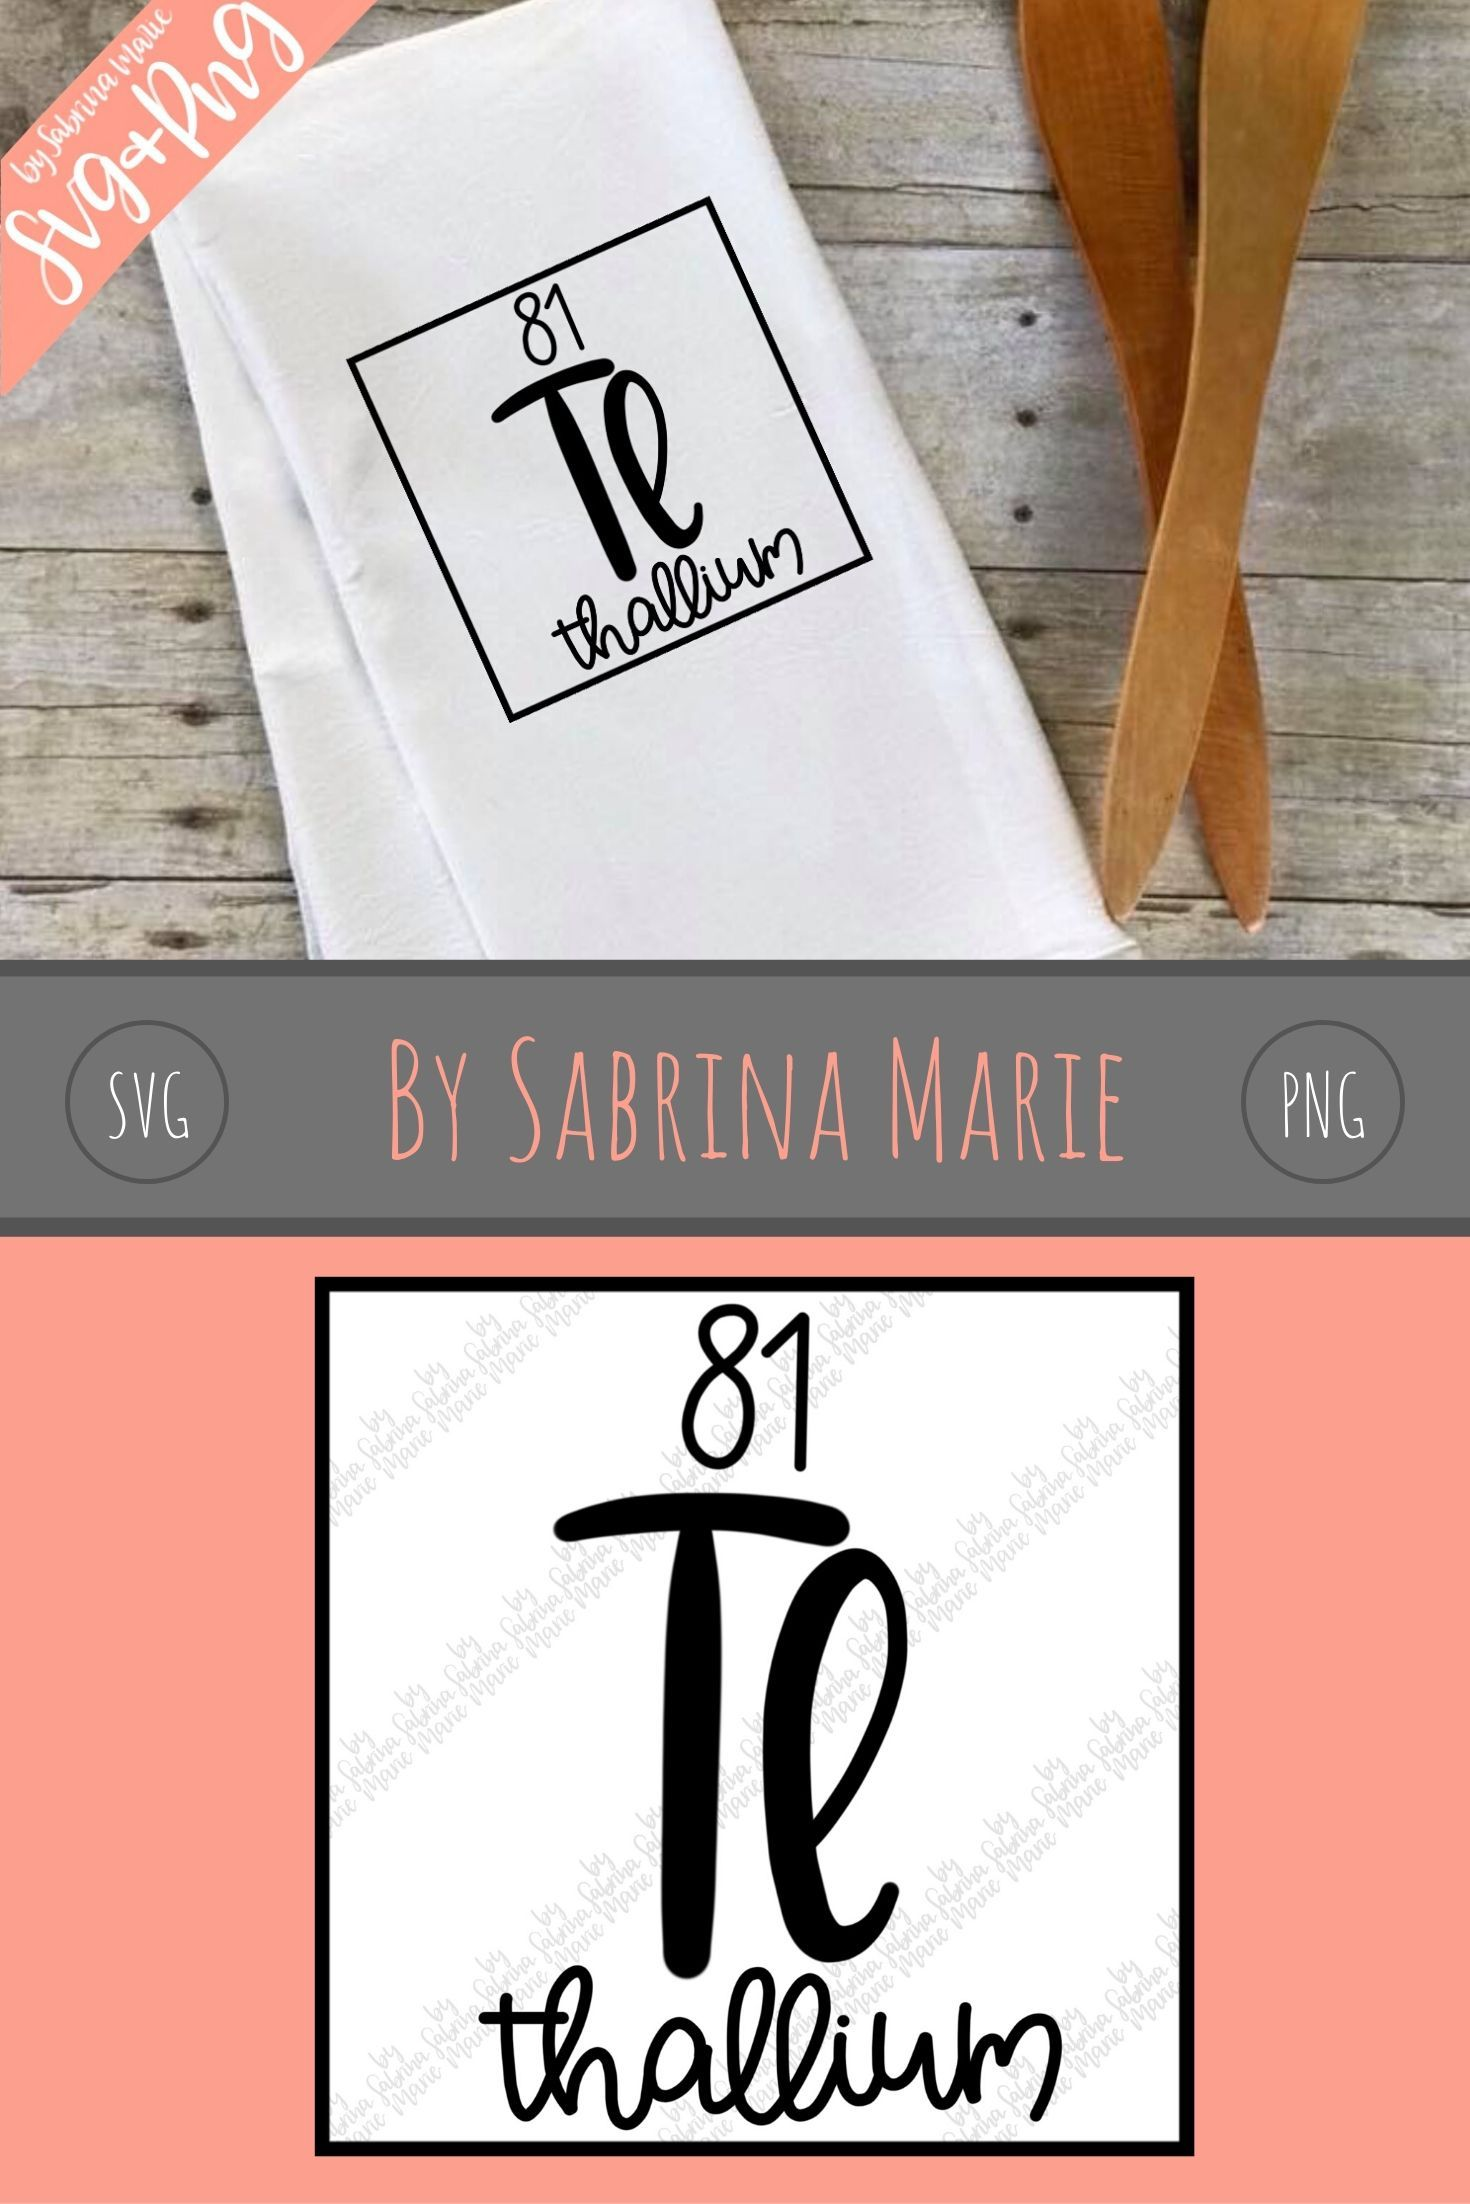 81 Thallium Tl  Handdrawn Periodic Table of the Elements Design  Digital Download SVG